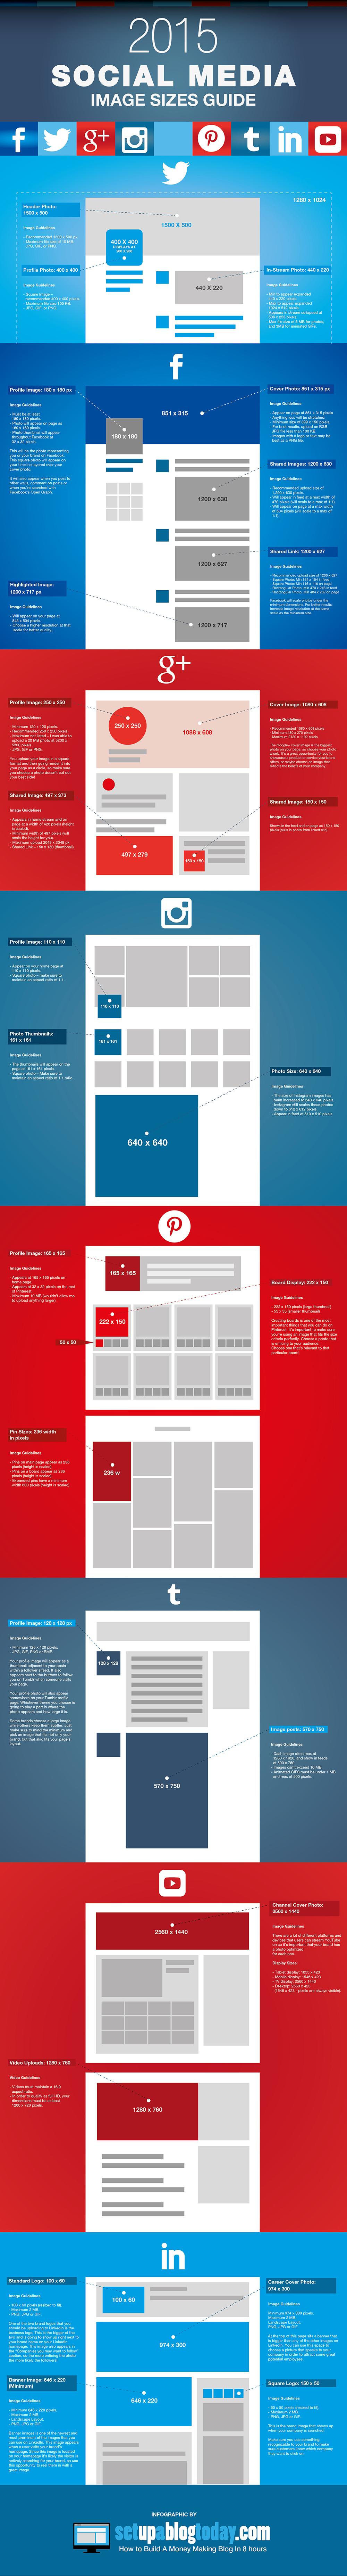 2015-social-media-image-sizes-infographic